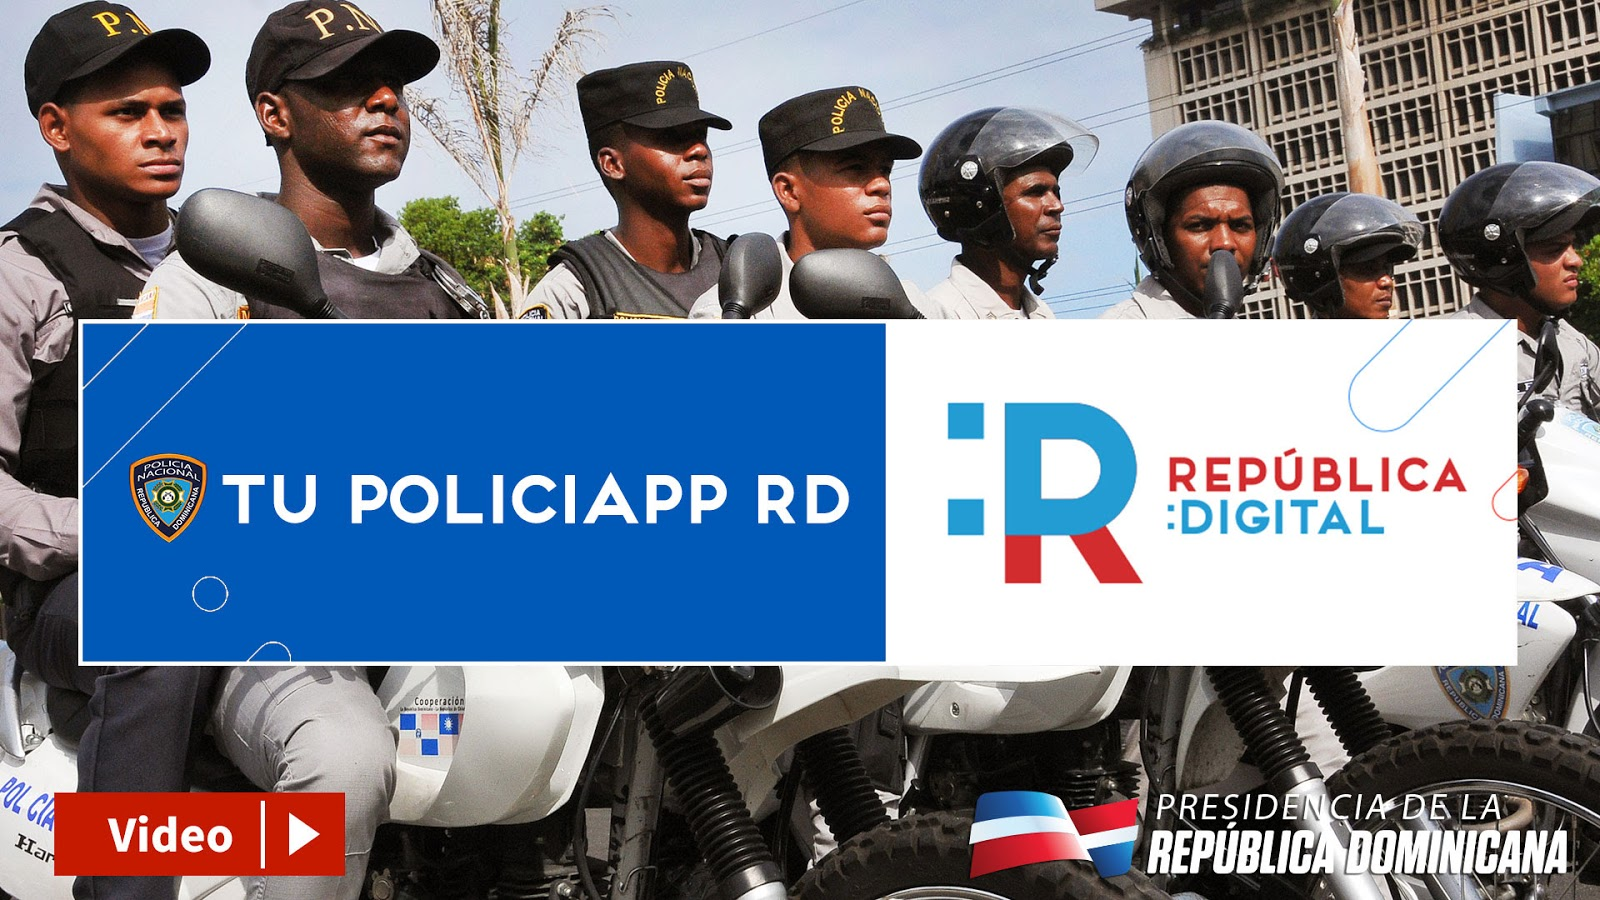 VIDEO: Tu PoliciaApp RD